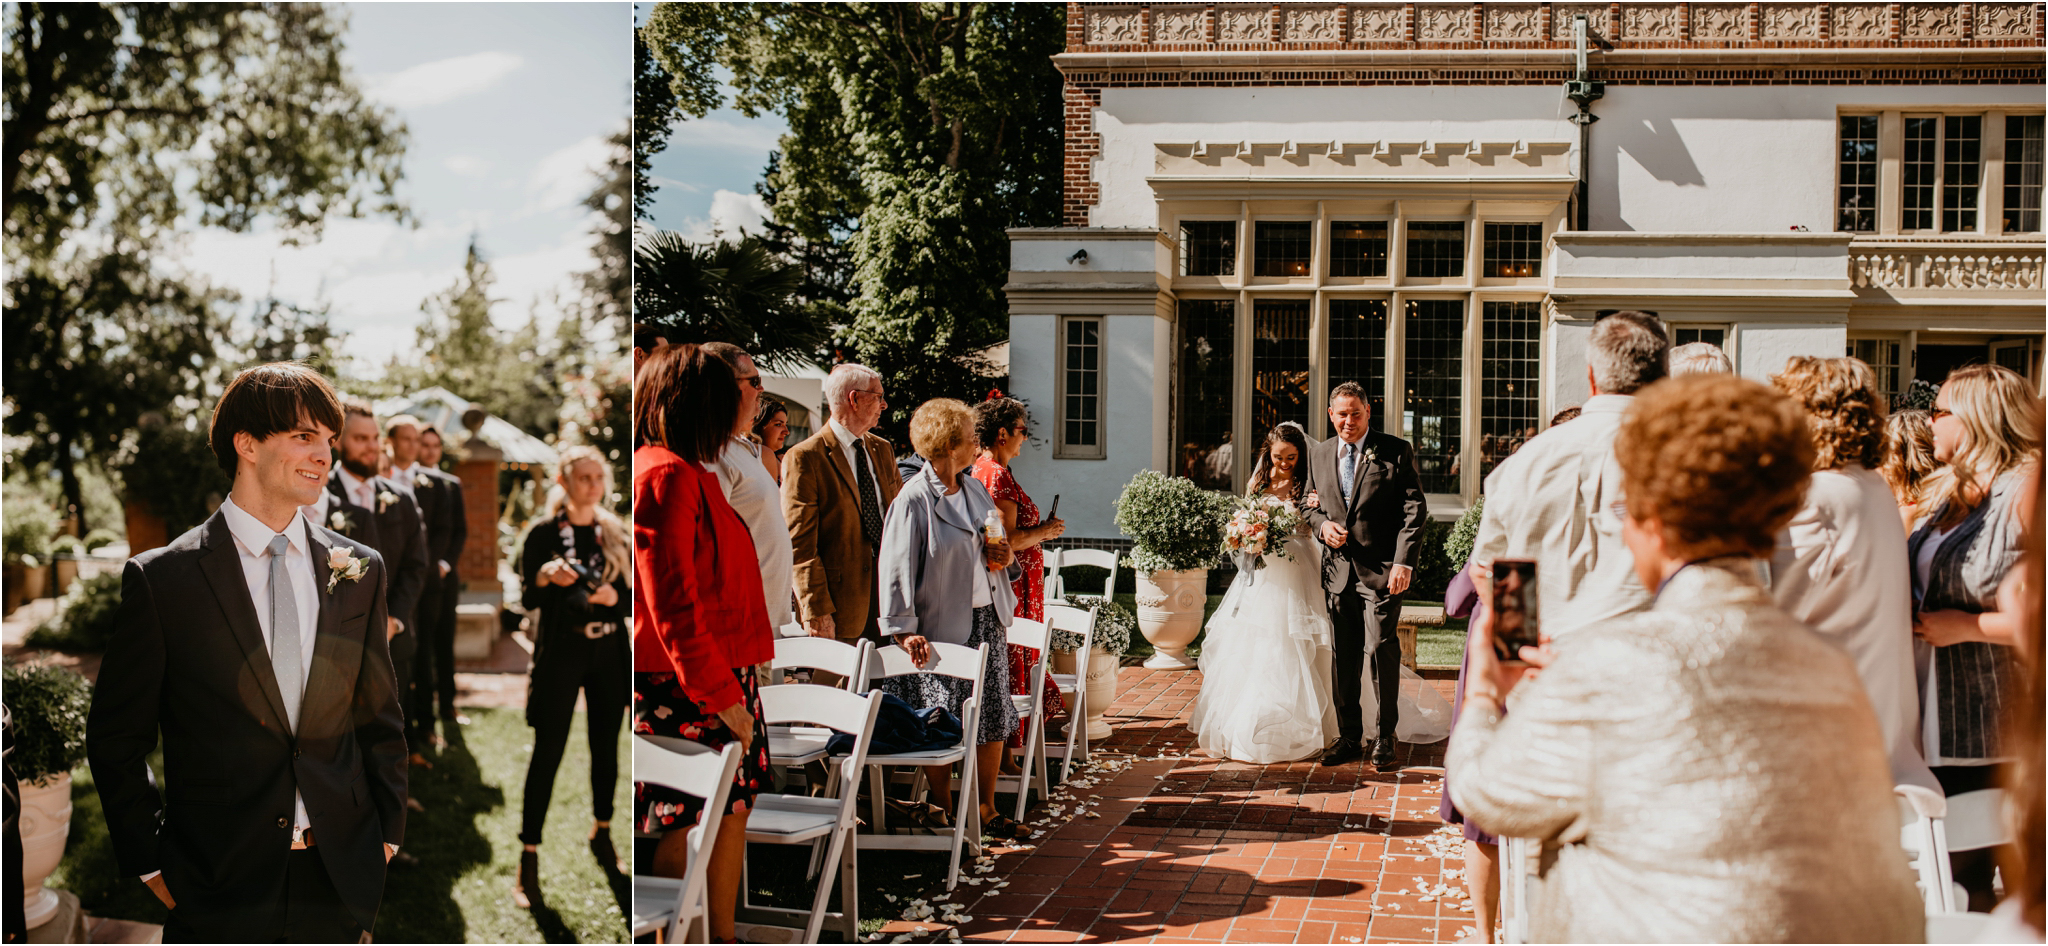 chance-and-ondrea-lairmont-manor-wedding-seattle-photographer-077.jpg